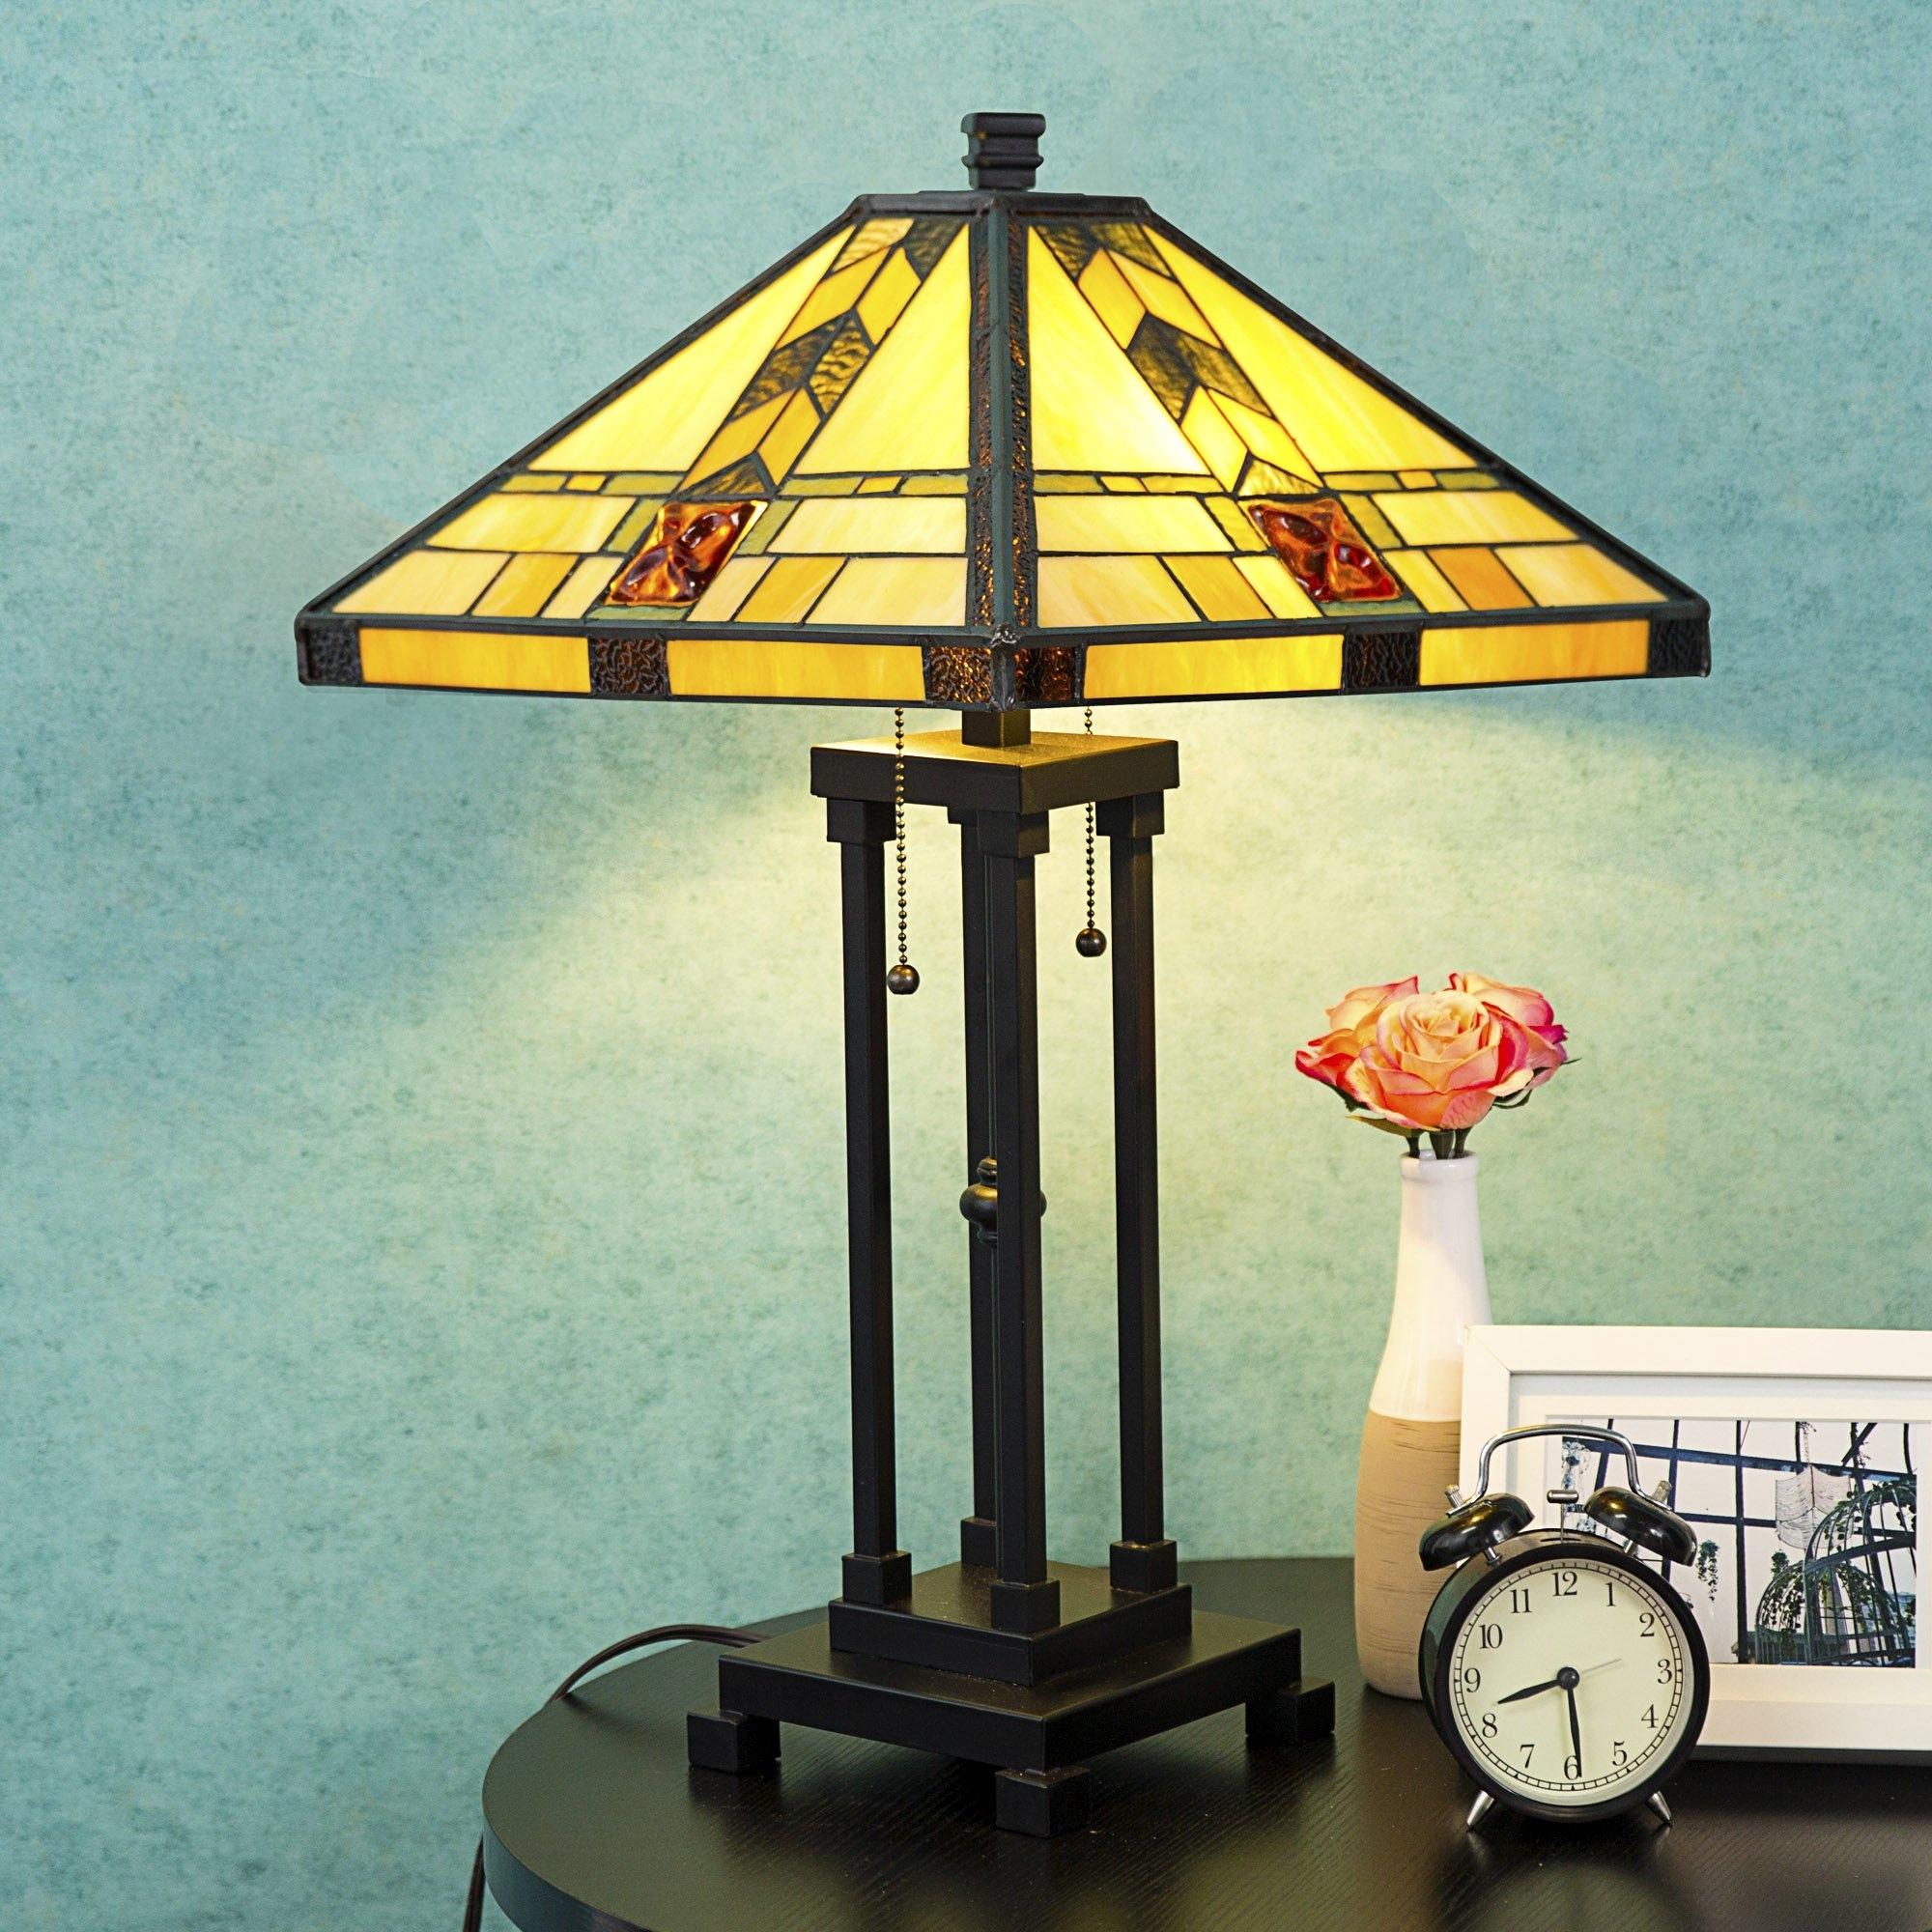 Tiffany Style Lamp Table Lamp Home Decor Lighting Mission Design Desk Lamp